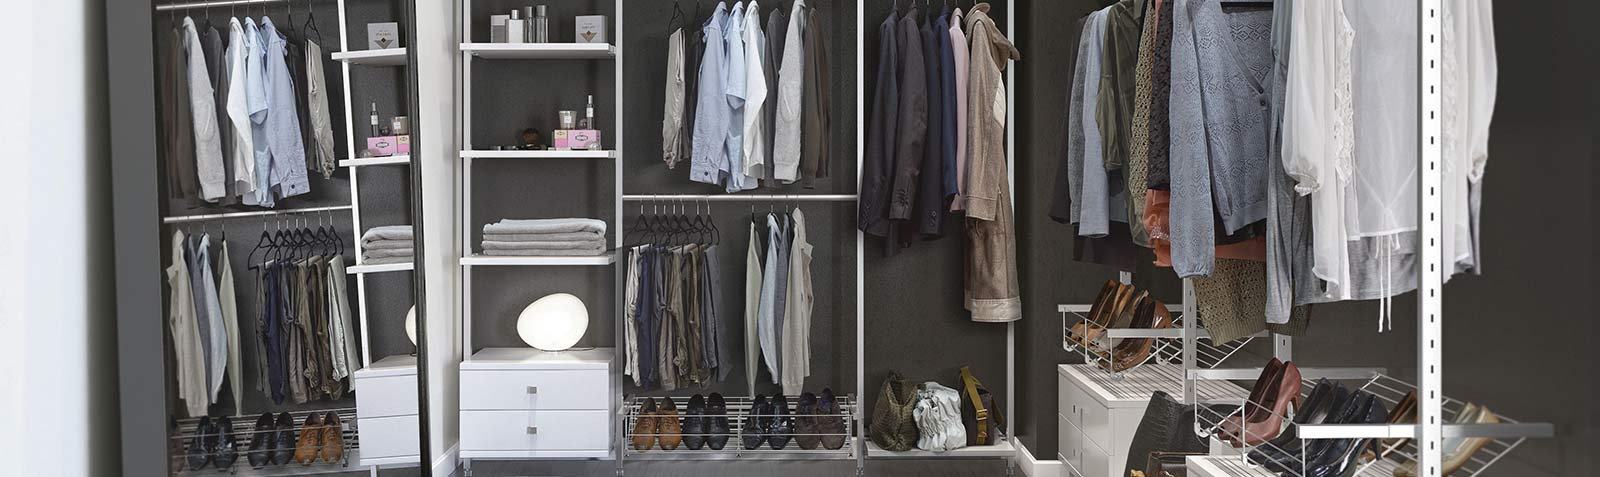 Wardrobe Interior Fittings Inserts Homebase Sliding